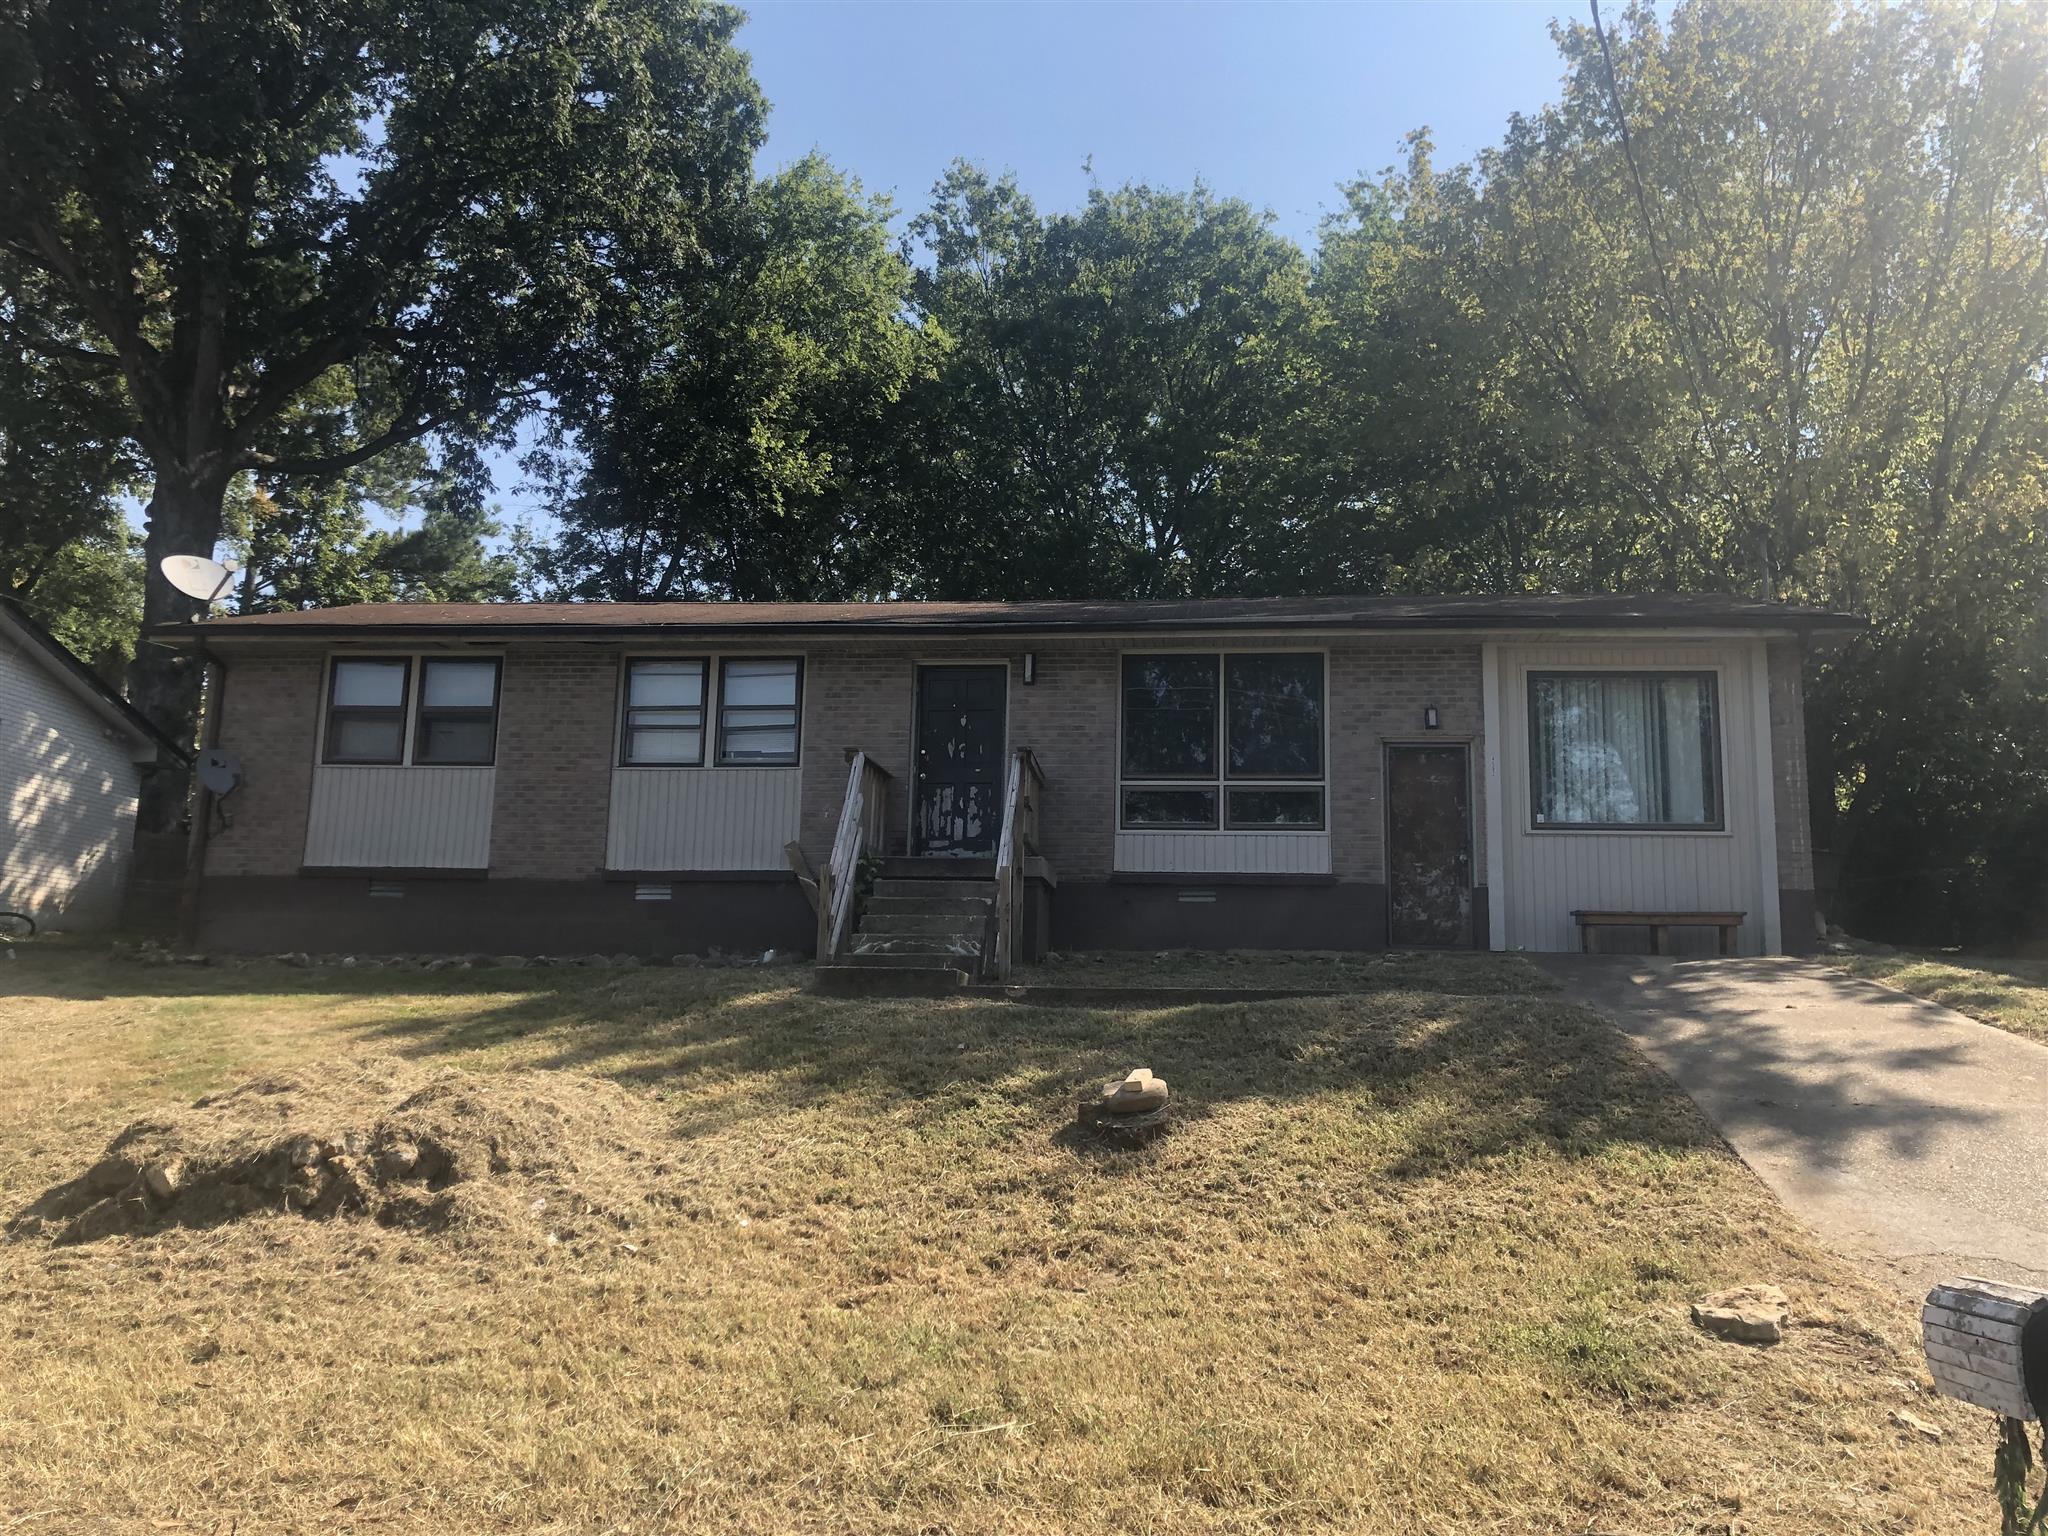 4562 Artelia Dr, Nashville-Antioch in Davidson County County, TN 37013 Home for Sale